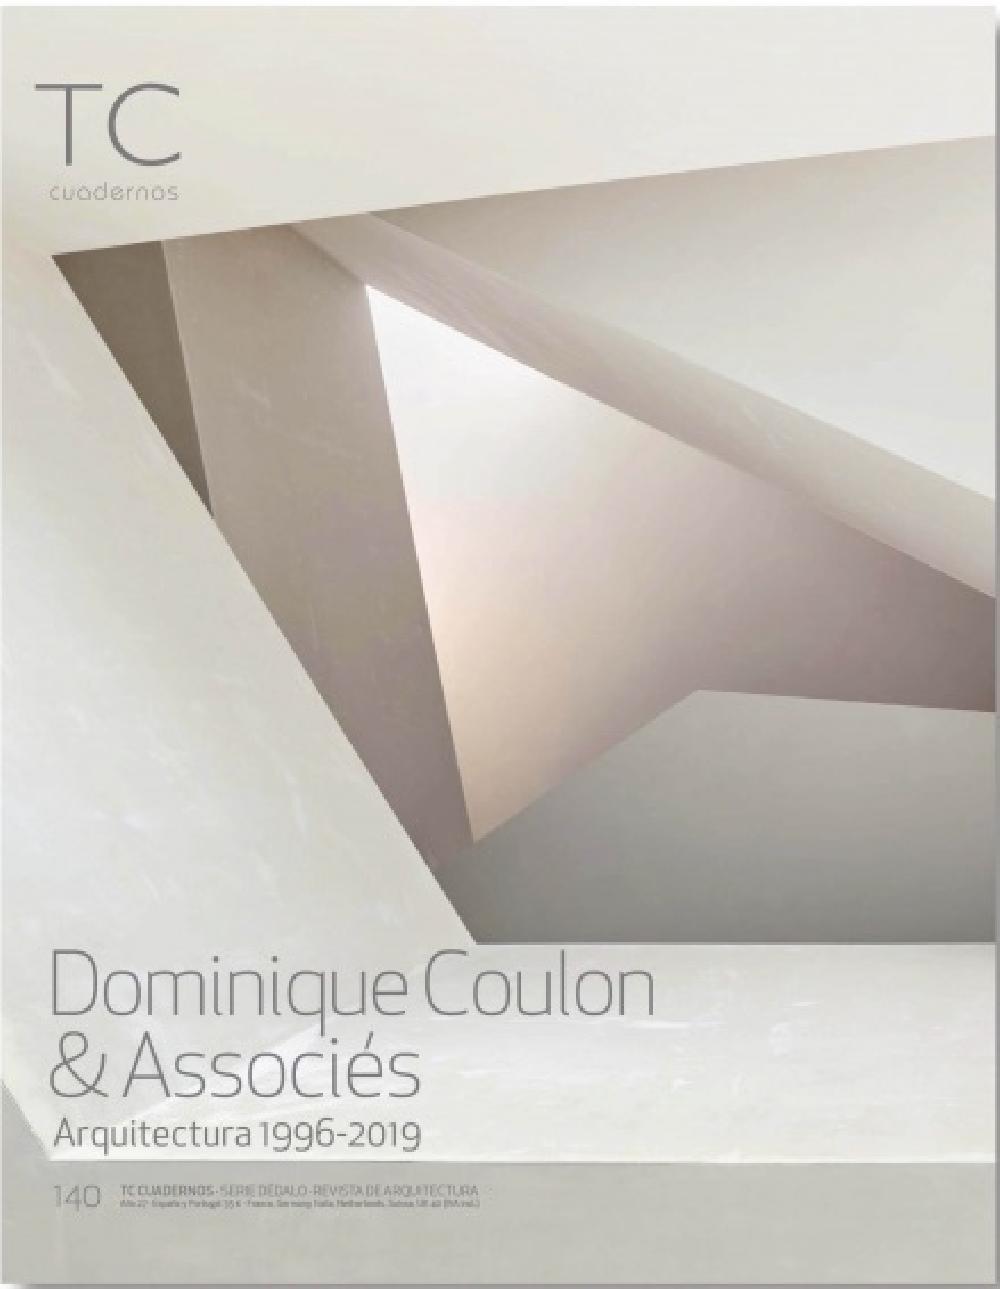 TC Cuadernos 140 - Dominique Coulon et Associés. Arquitectura 1996-2019